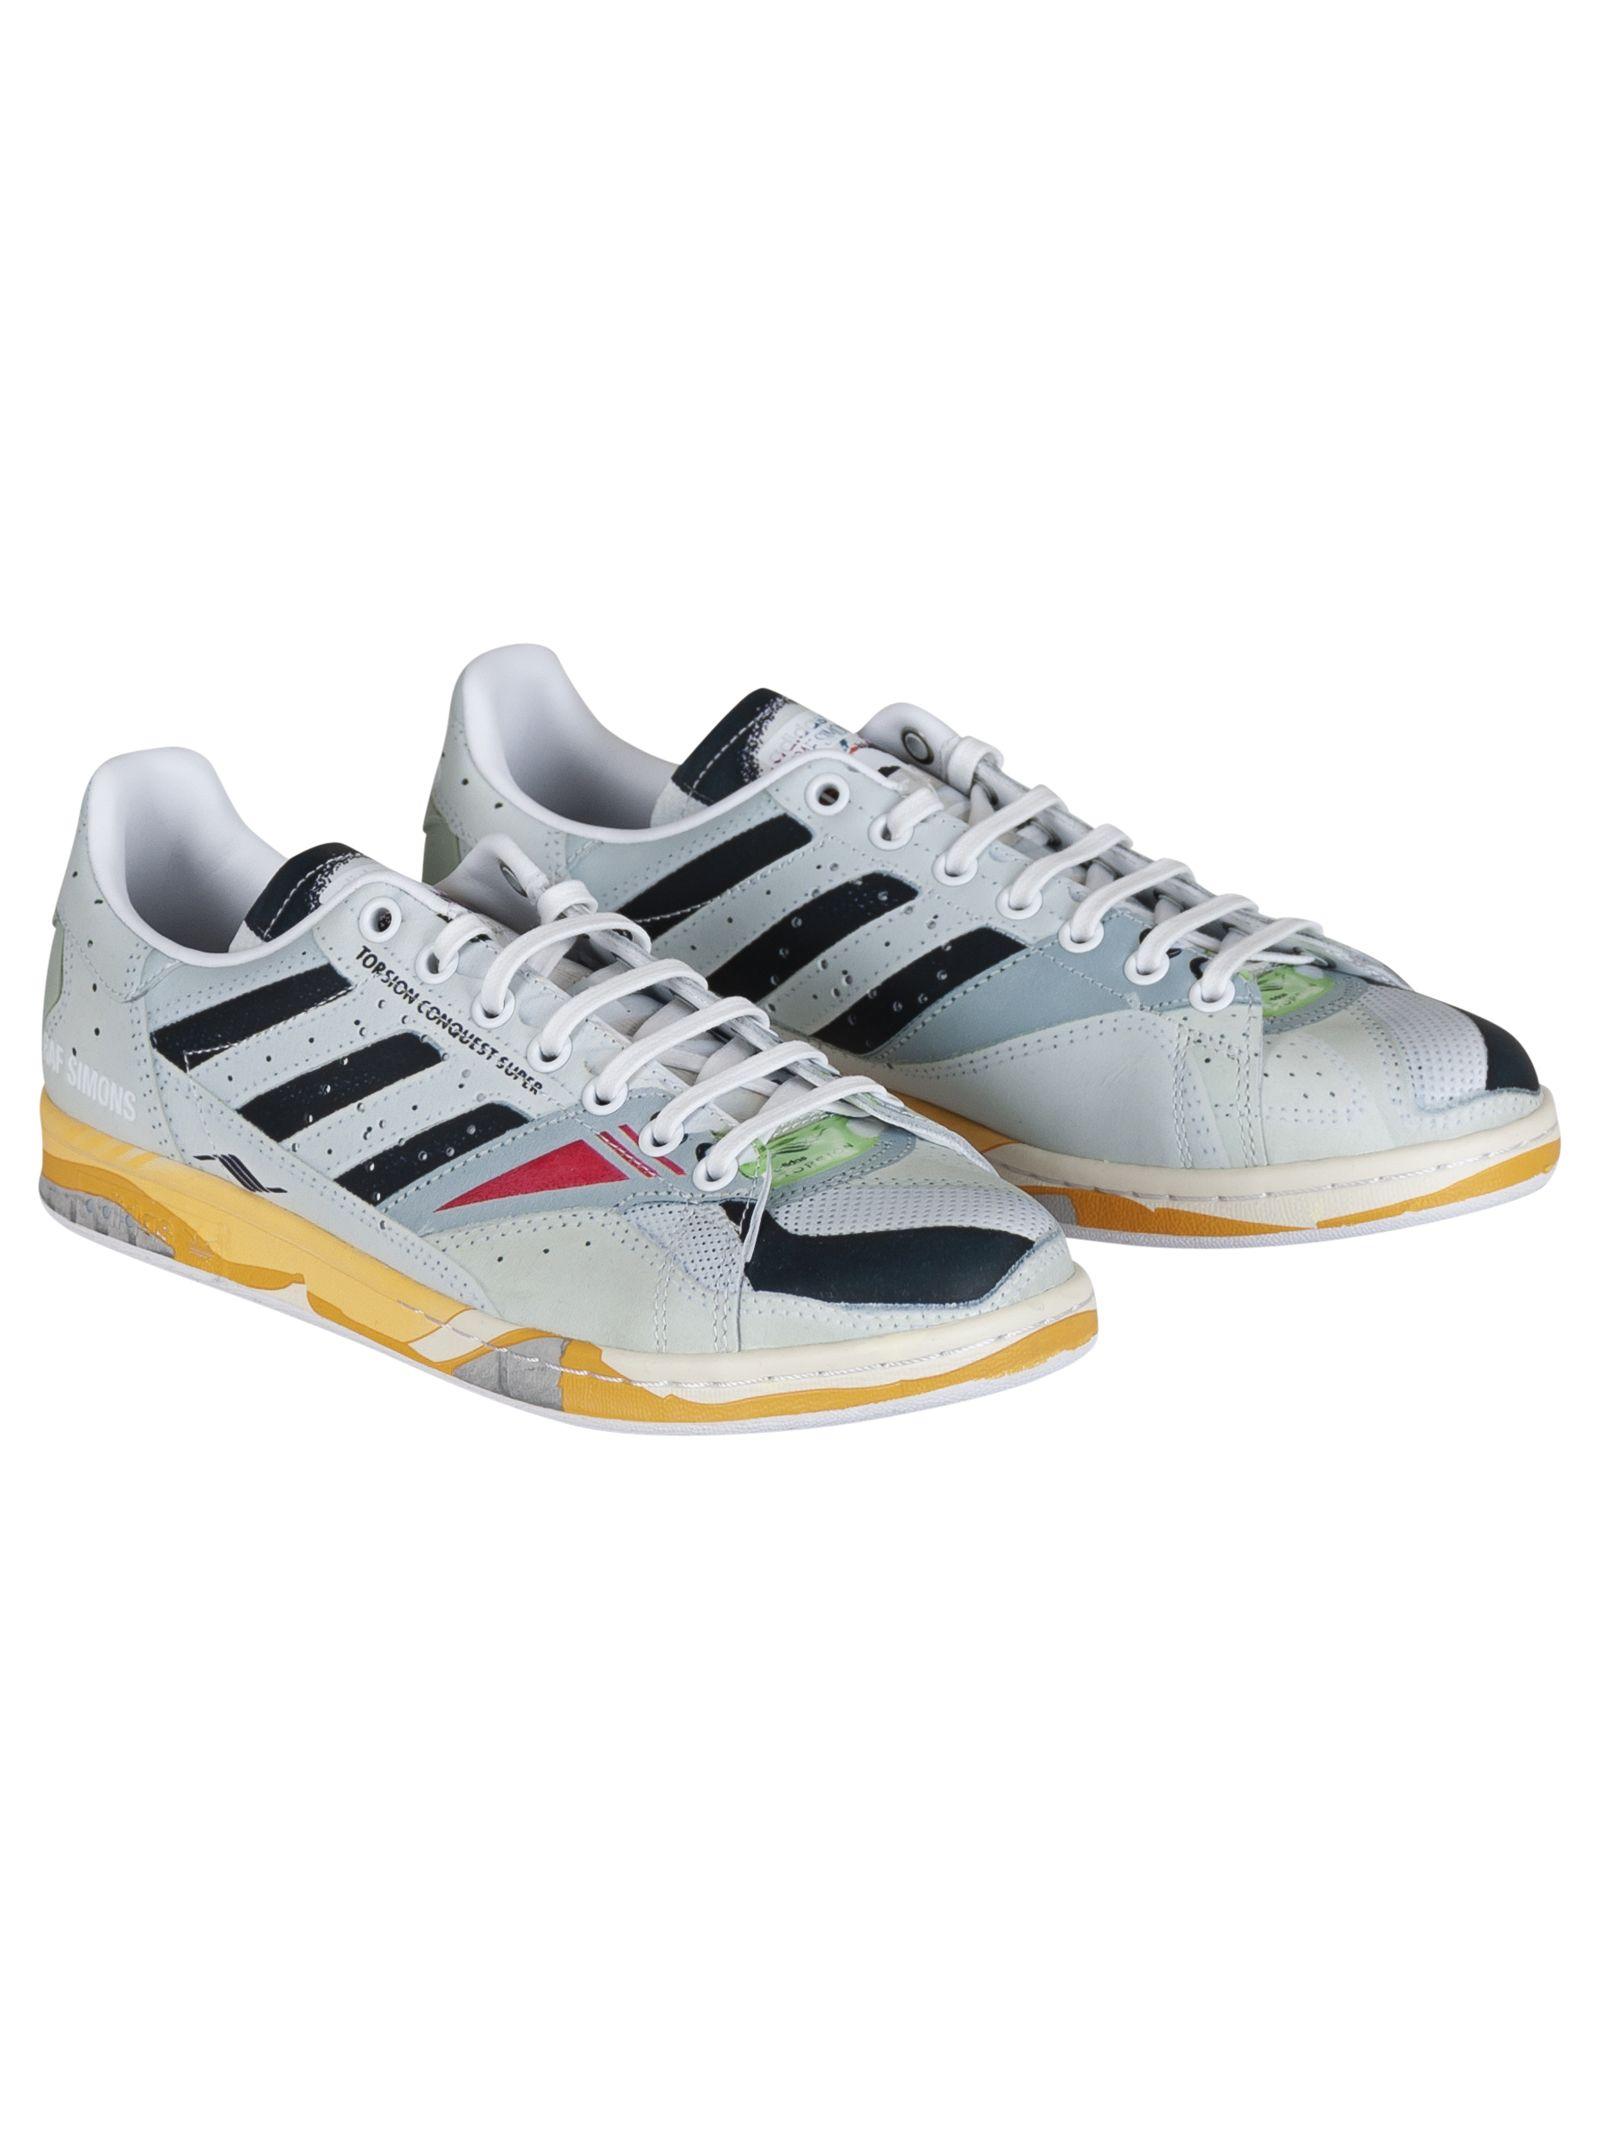 4b359e68c2c65 Raf Simons Adidas By Raf Simons Rs Torsion Stan - White - 10921933 ...